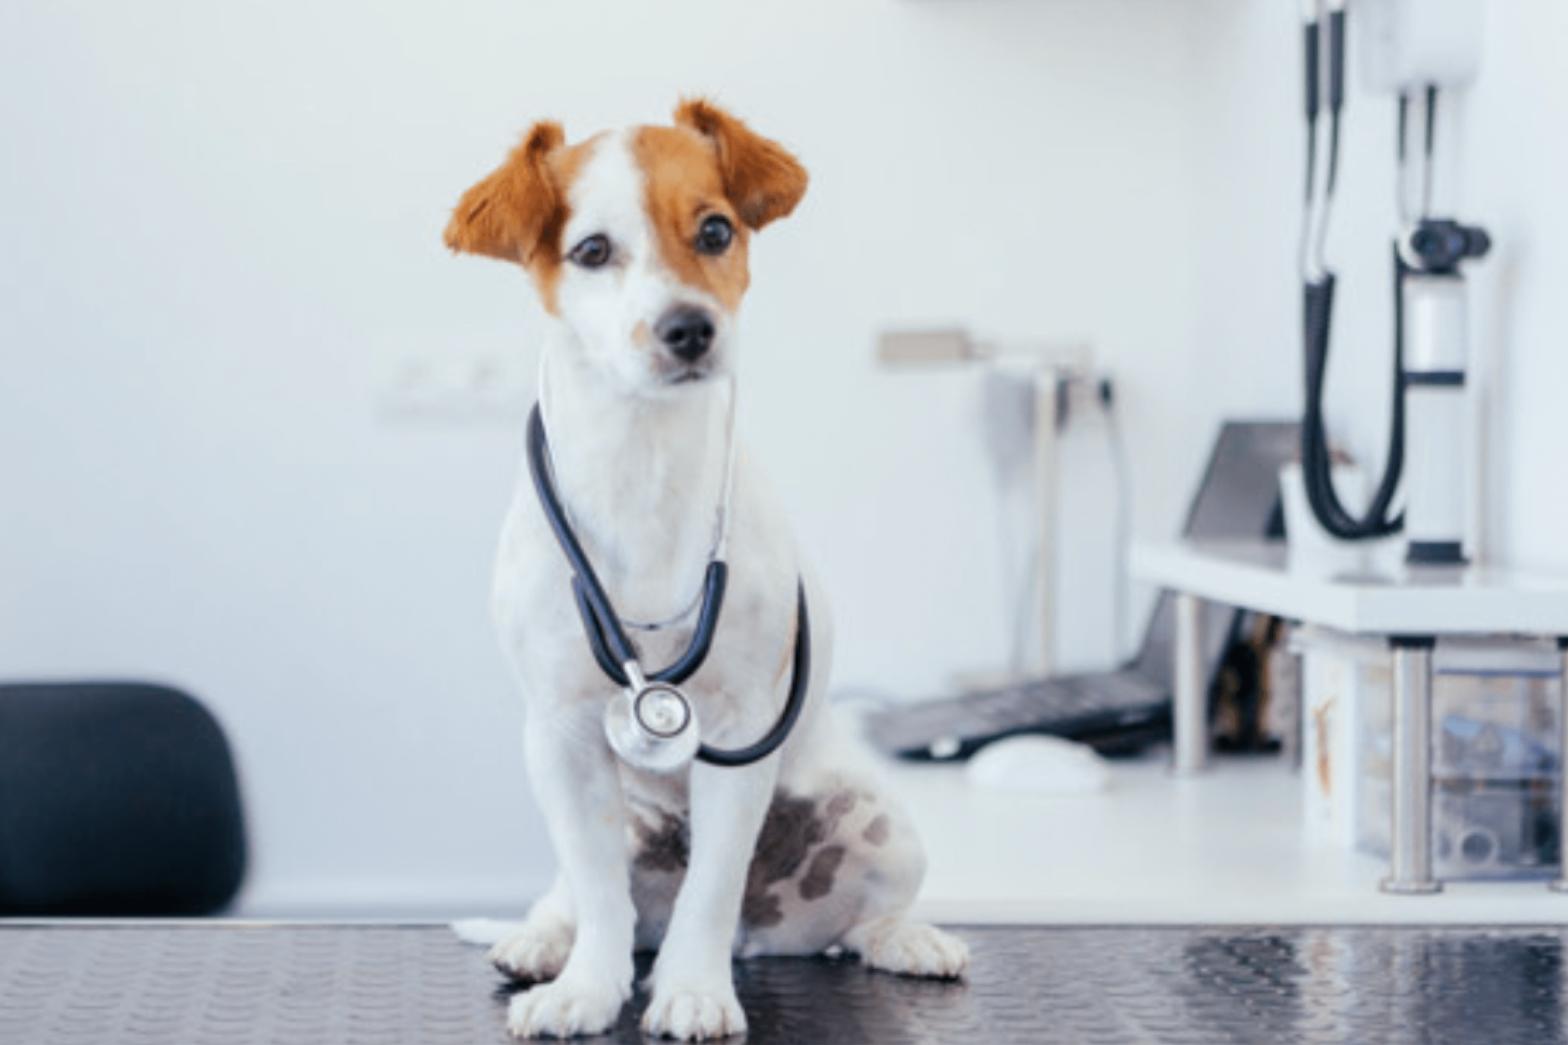 Pandemia impulsiona serviço de telerradiologia veterinária no Brasil